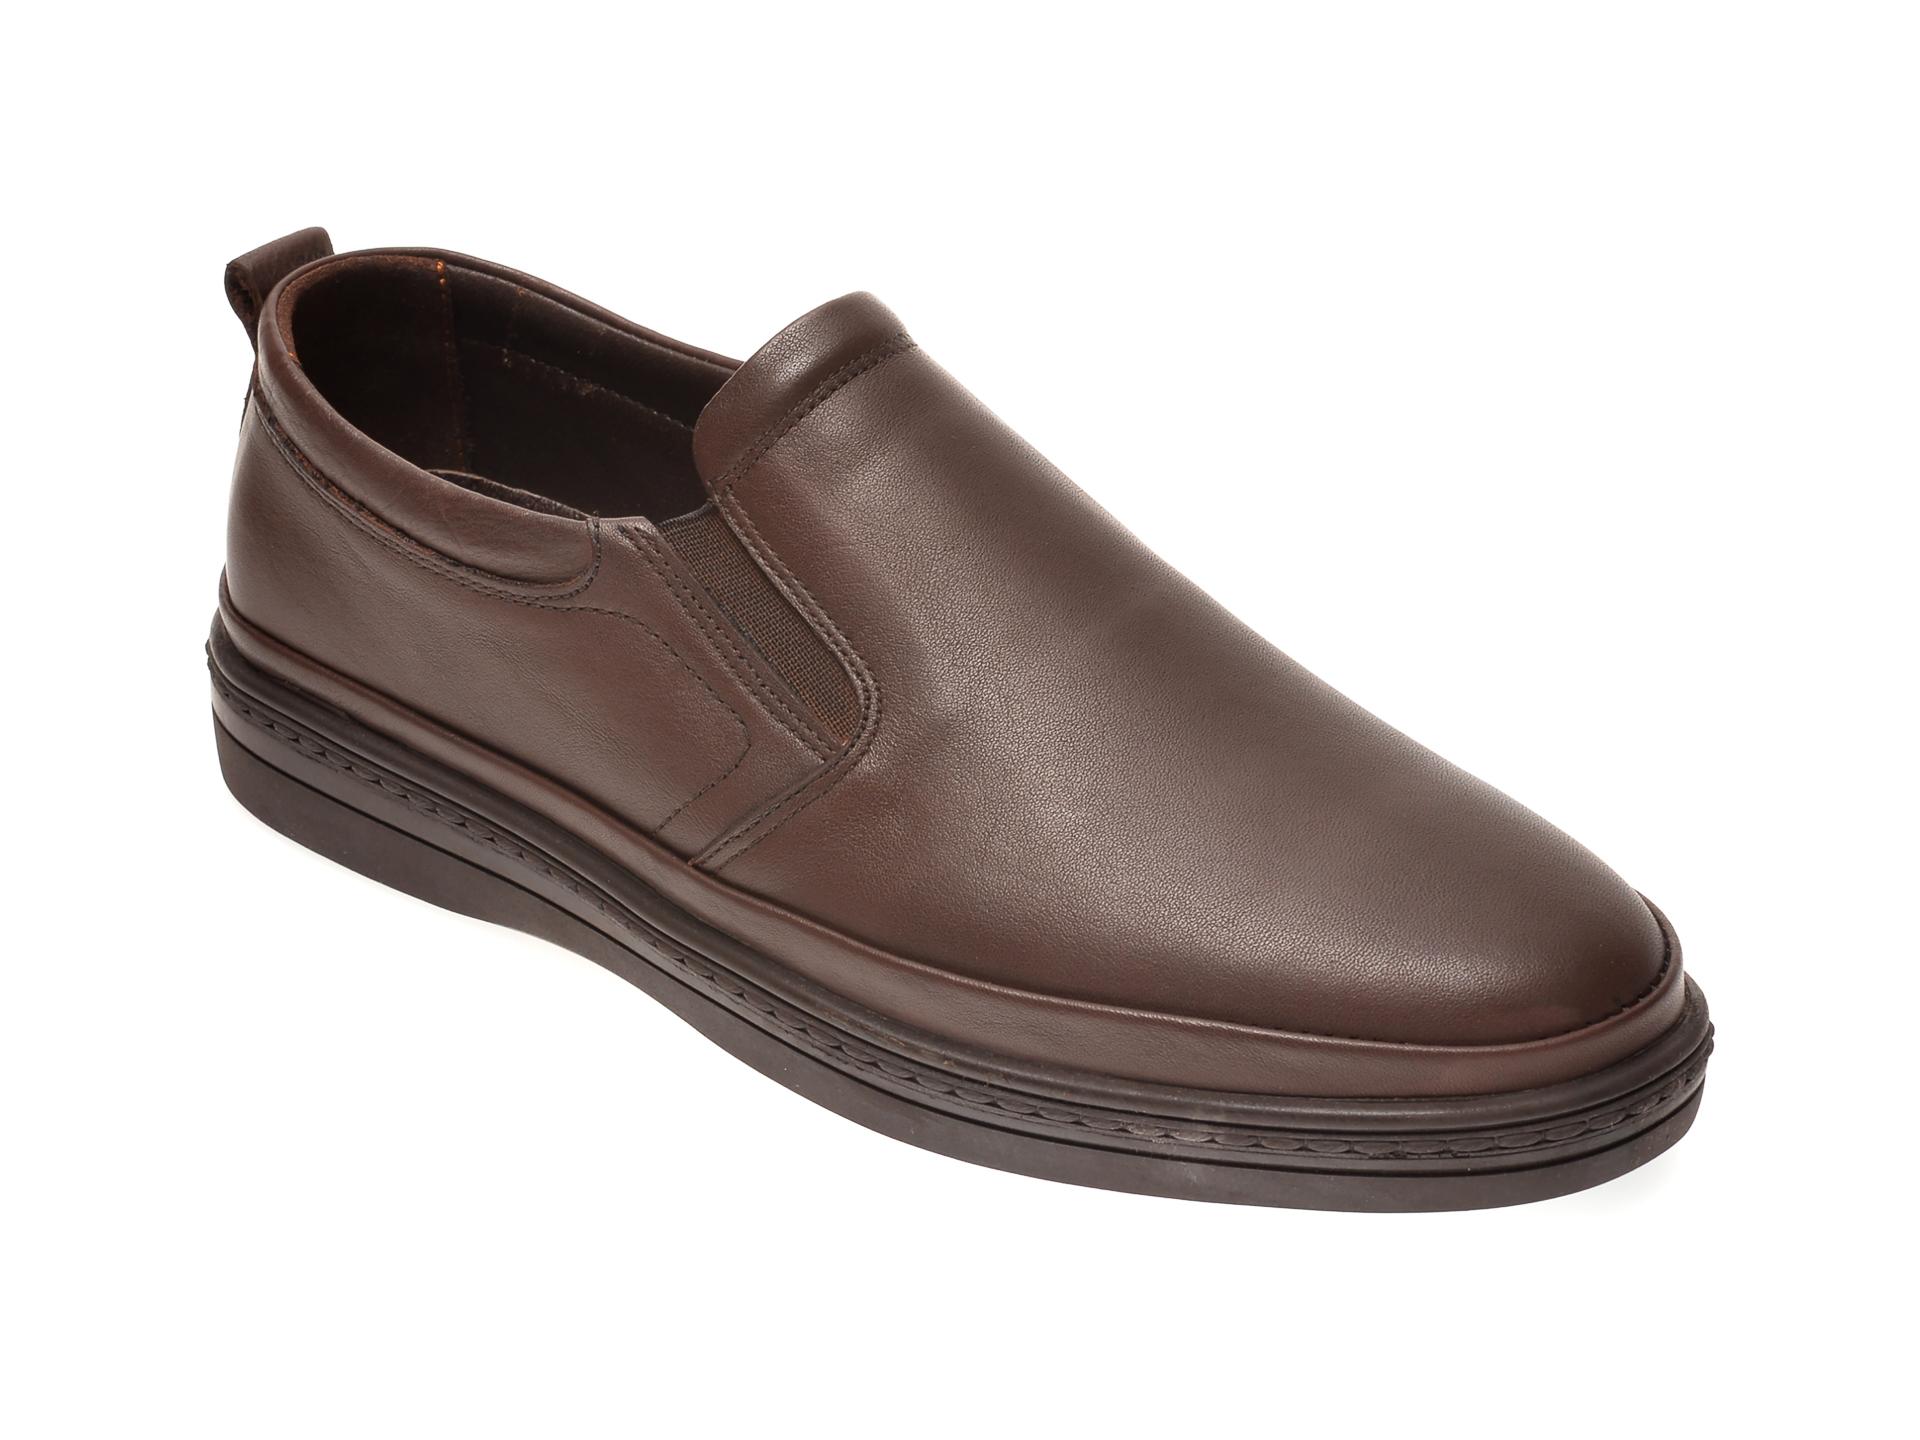 Pantofi OTTER maro, M5741, din piele naturala imagine